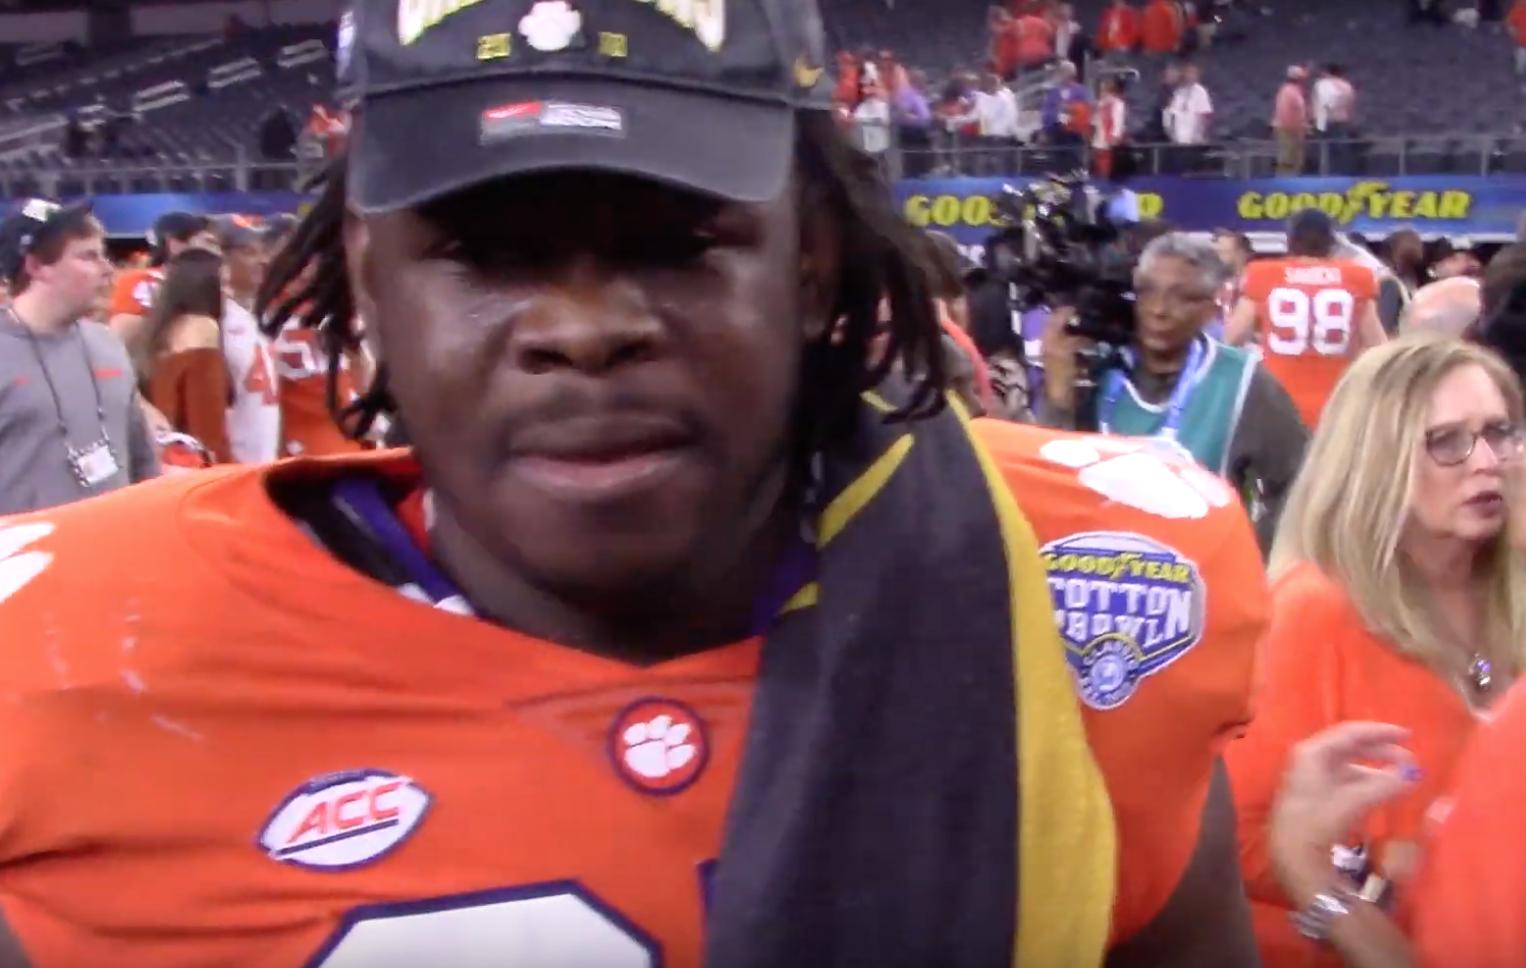 Albert Huggins reacts to Clemson's dominant win over Notre Dame in exclusive postgame interview (Video)